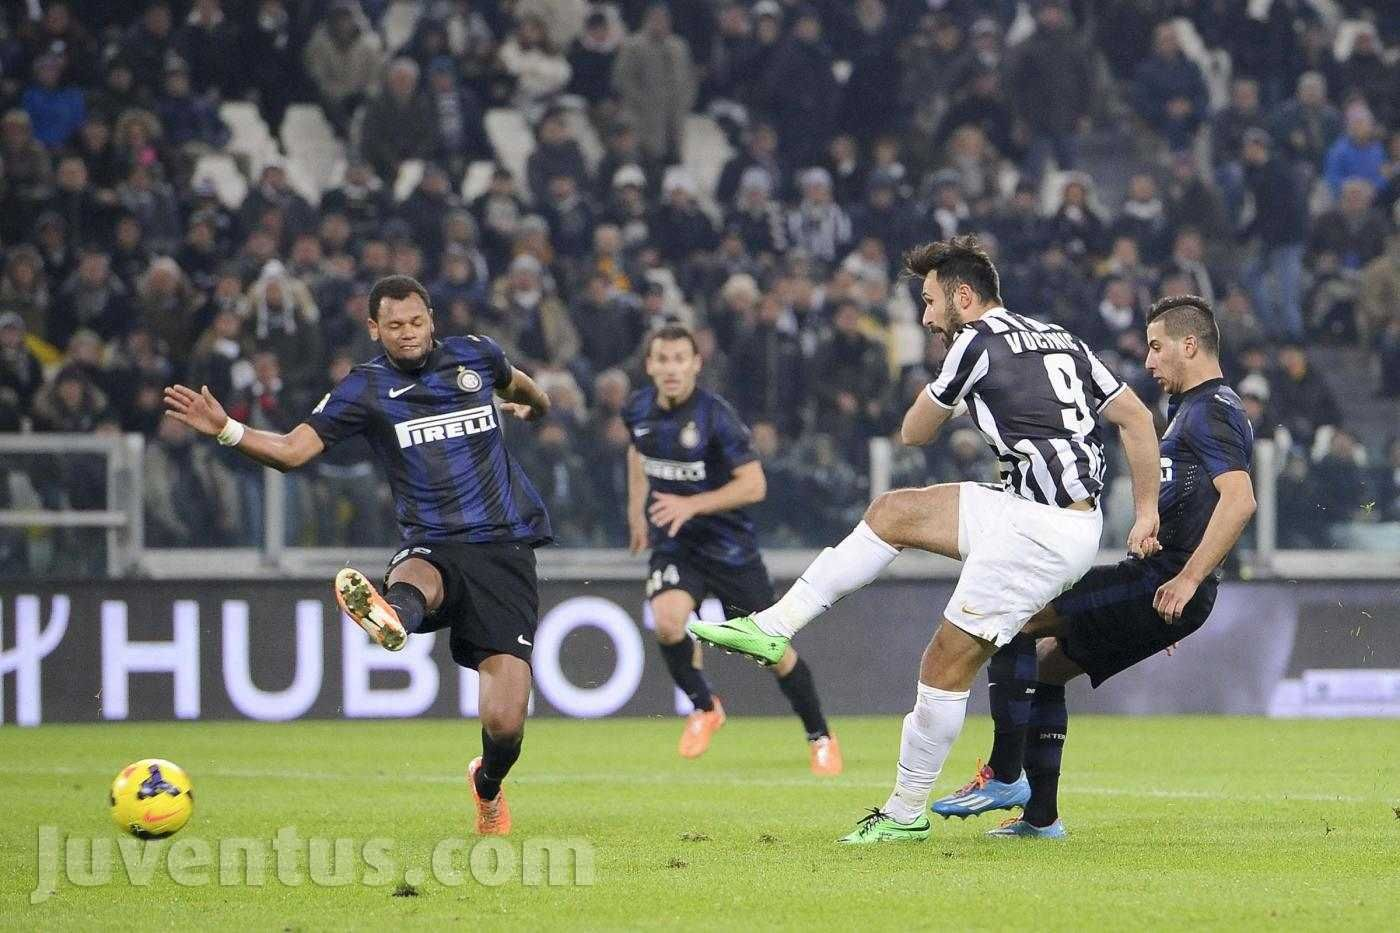 Juventus Internazionale 3-1 - Per sempre Mirko